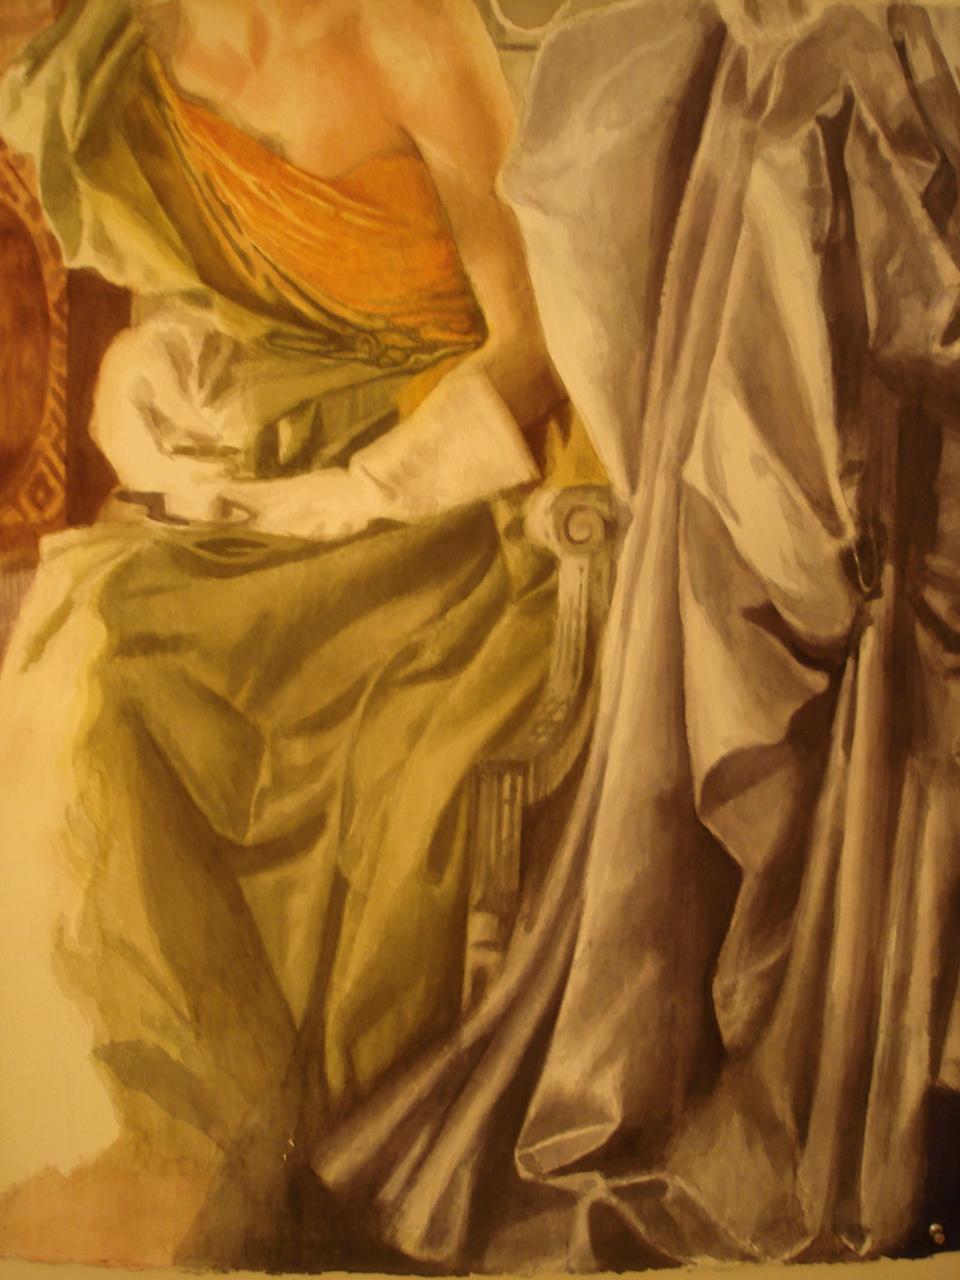 Watercolor on paper 30 x 30 inches Tarek Ashkar,1998